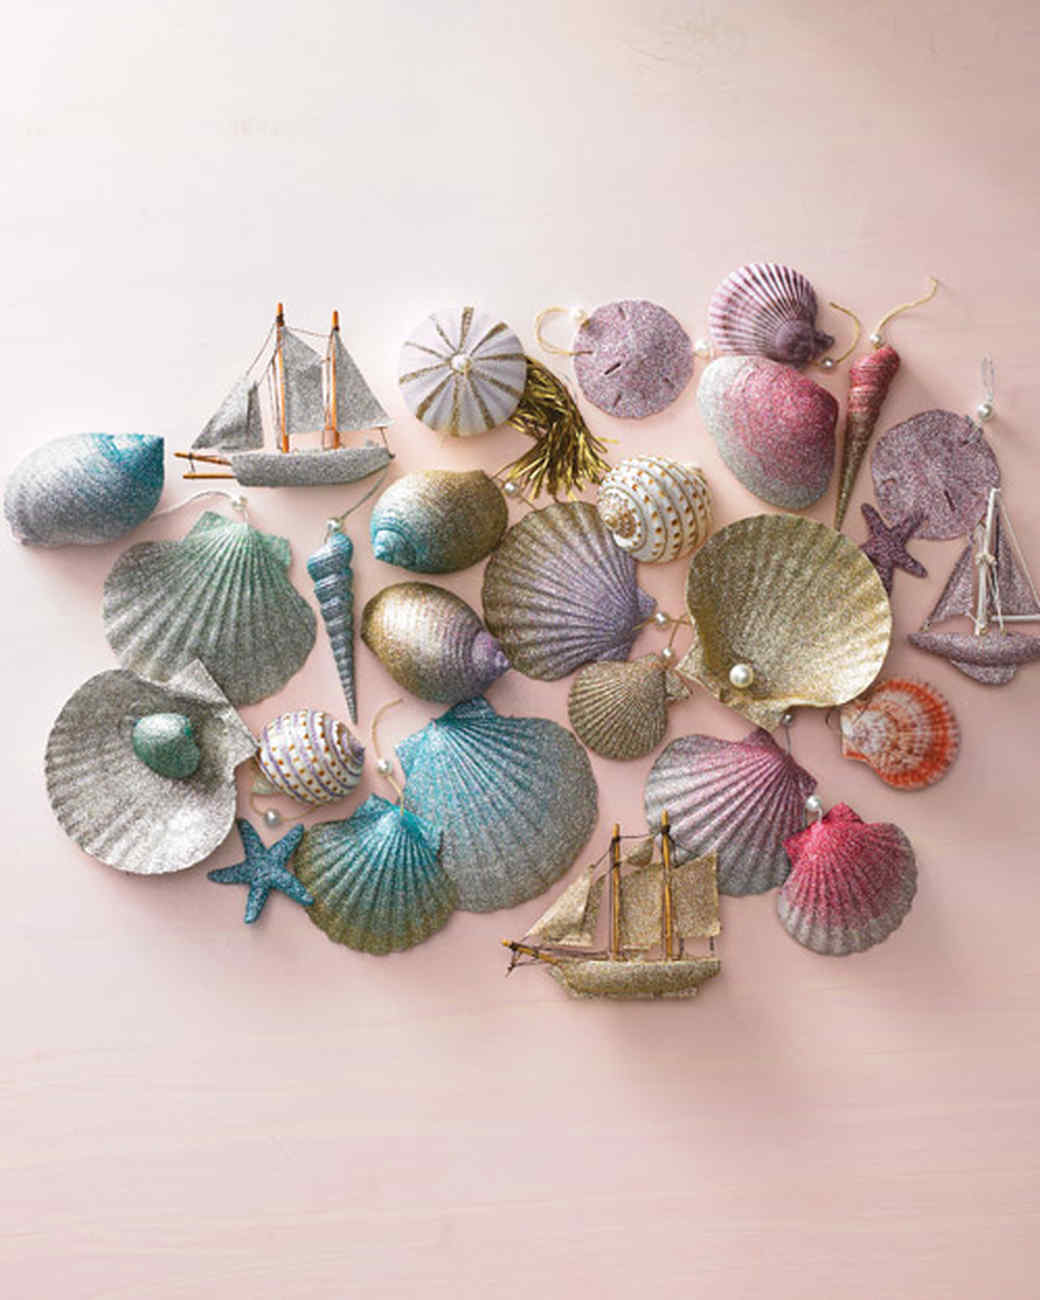 6 Ombre Glittered Seashell Ornaments